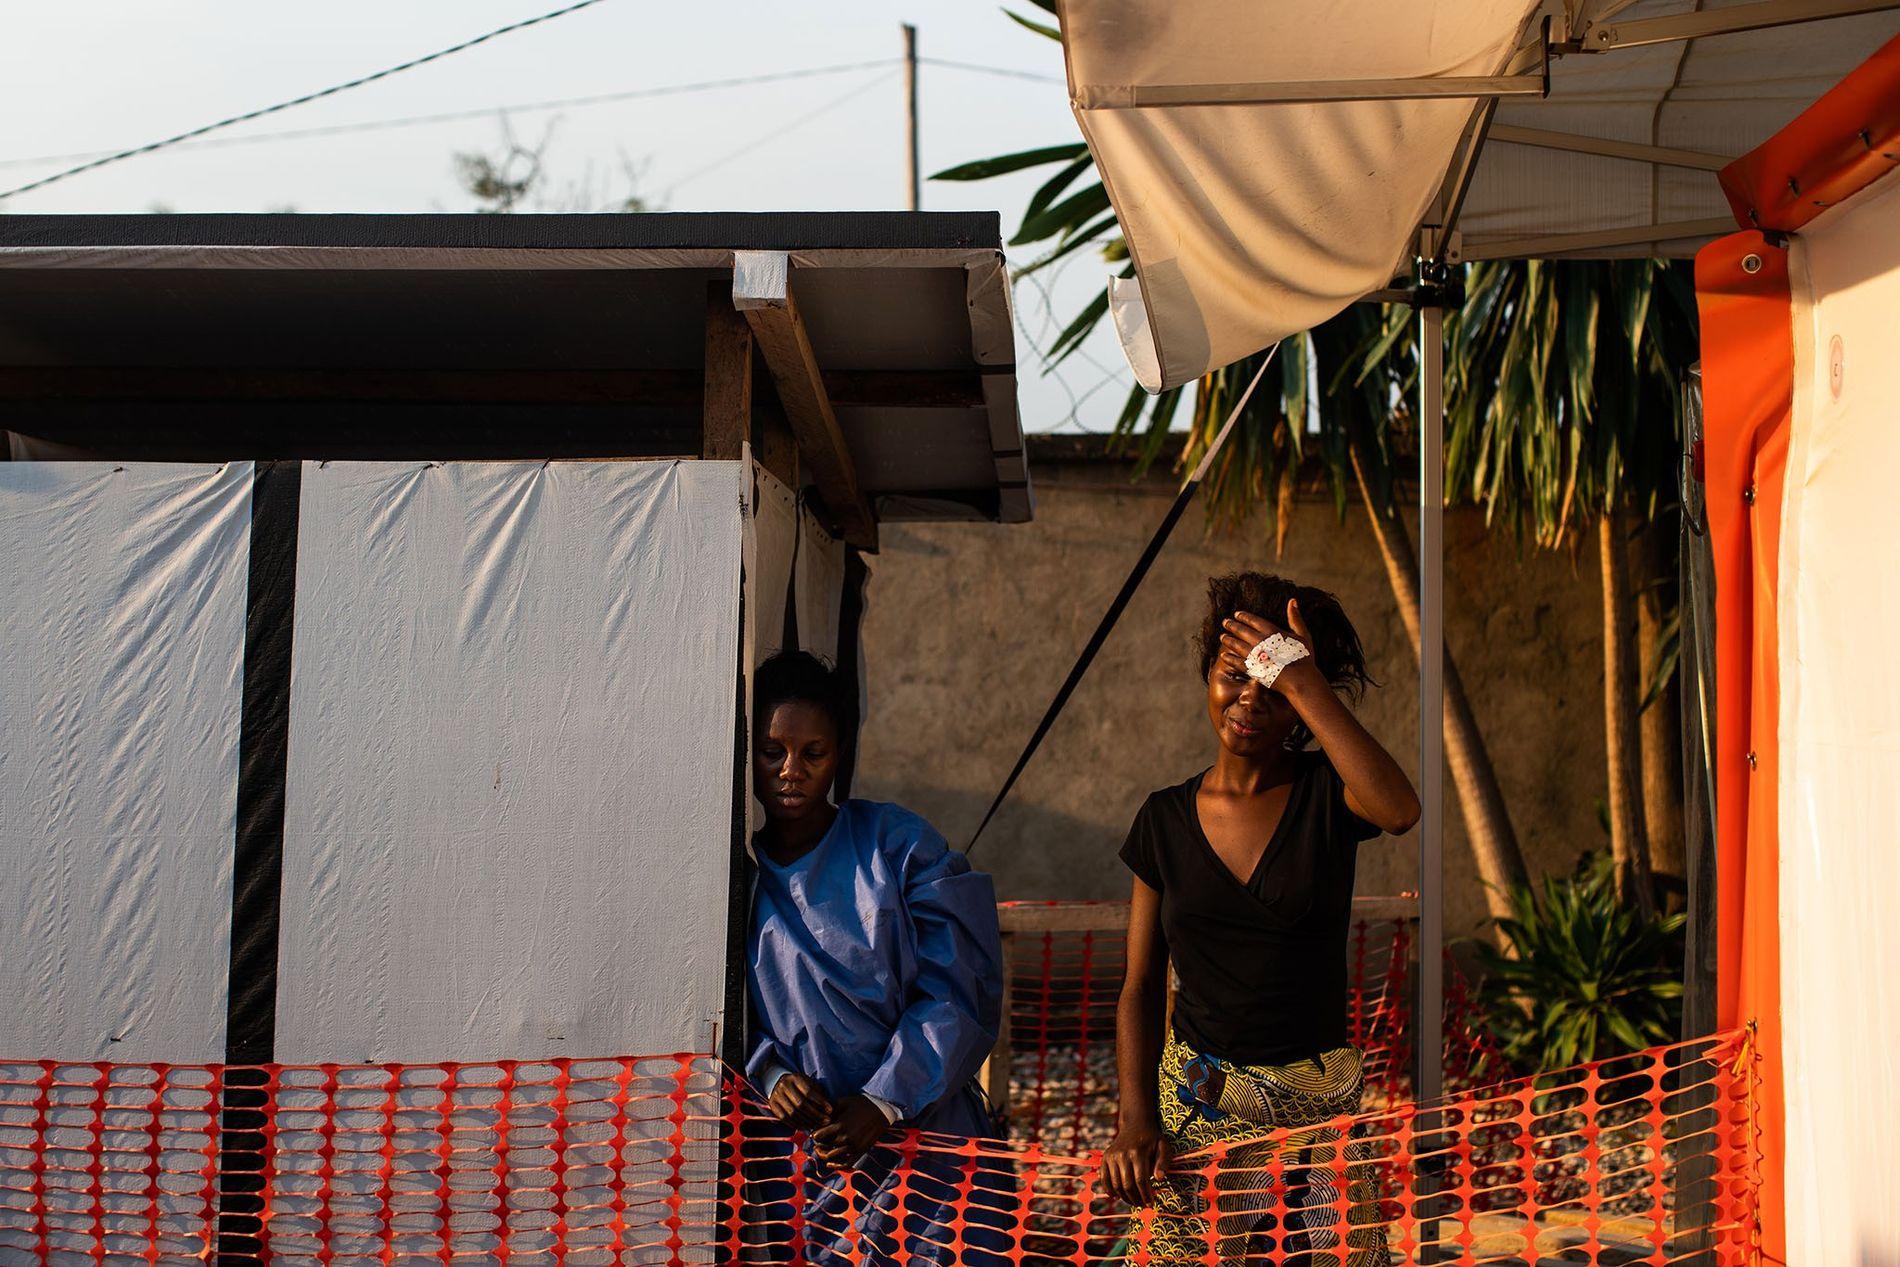 Kavugho Mukoni Romelie